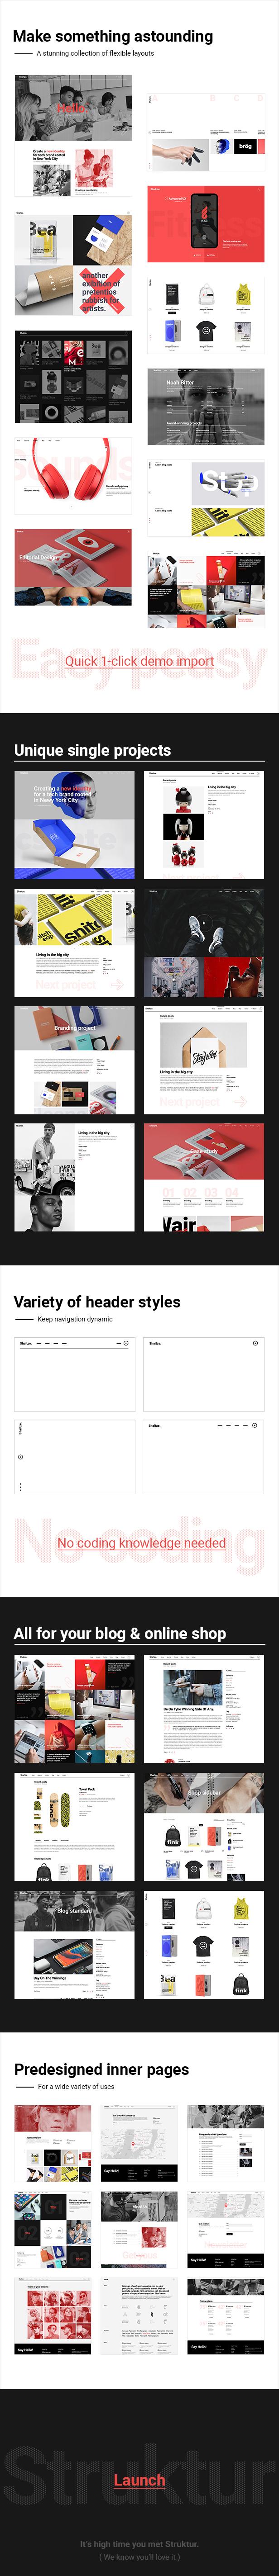 Struktur - Creative Agency Theme - 2